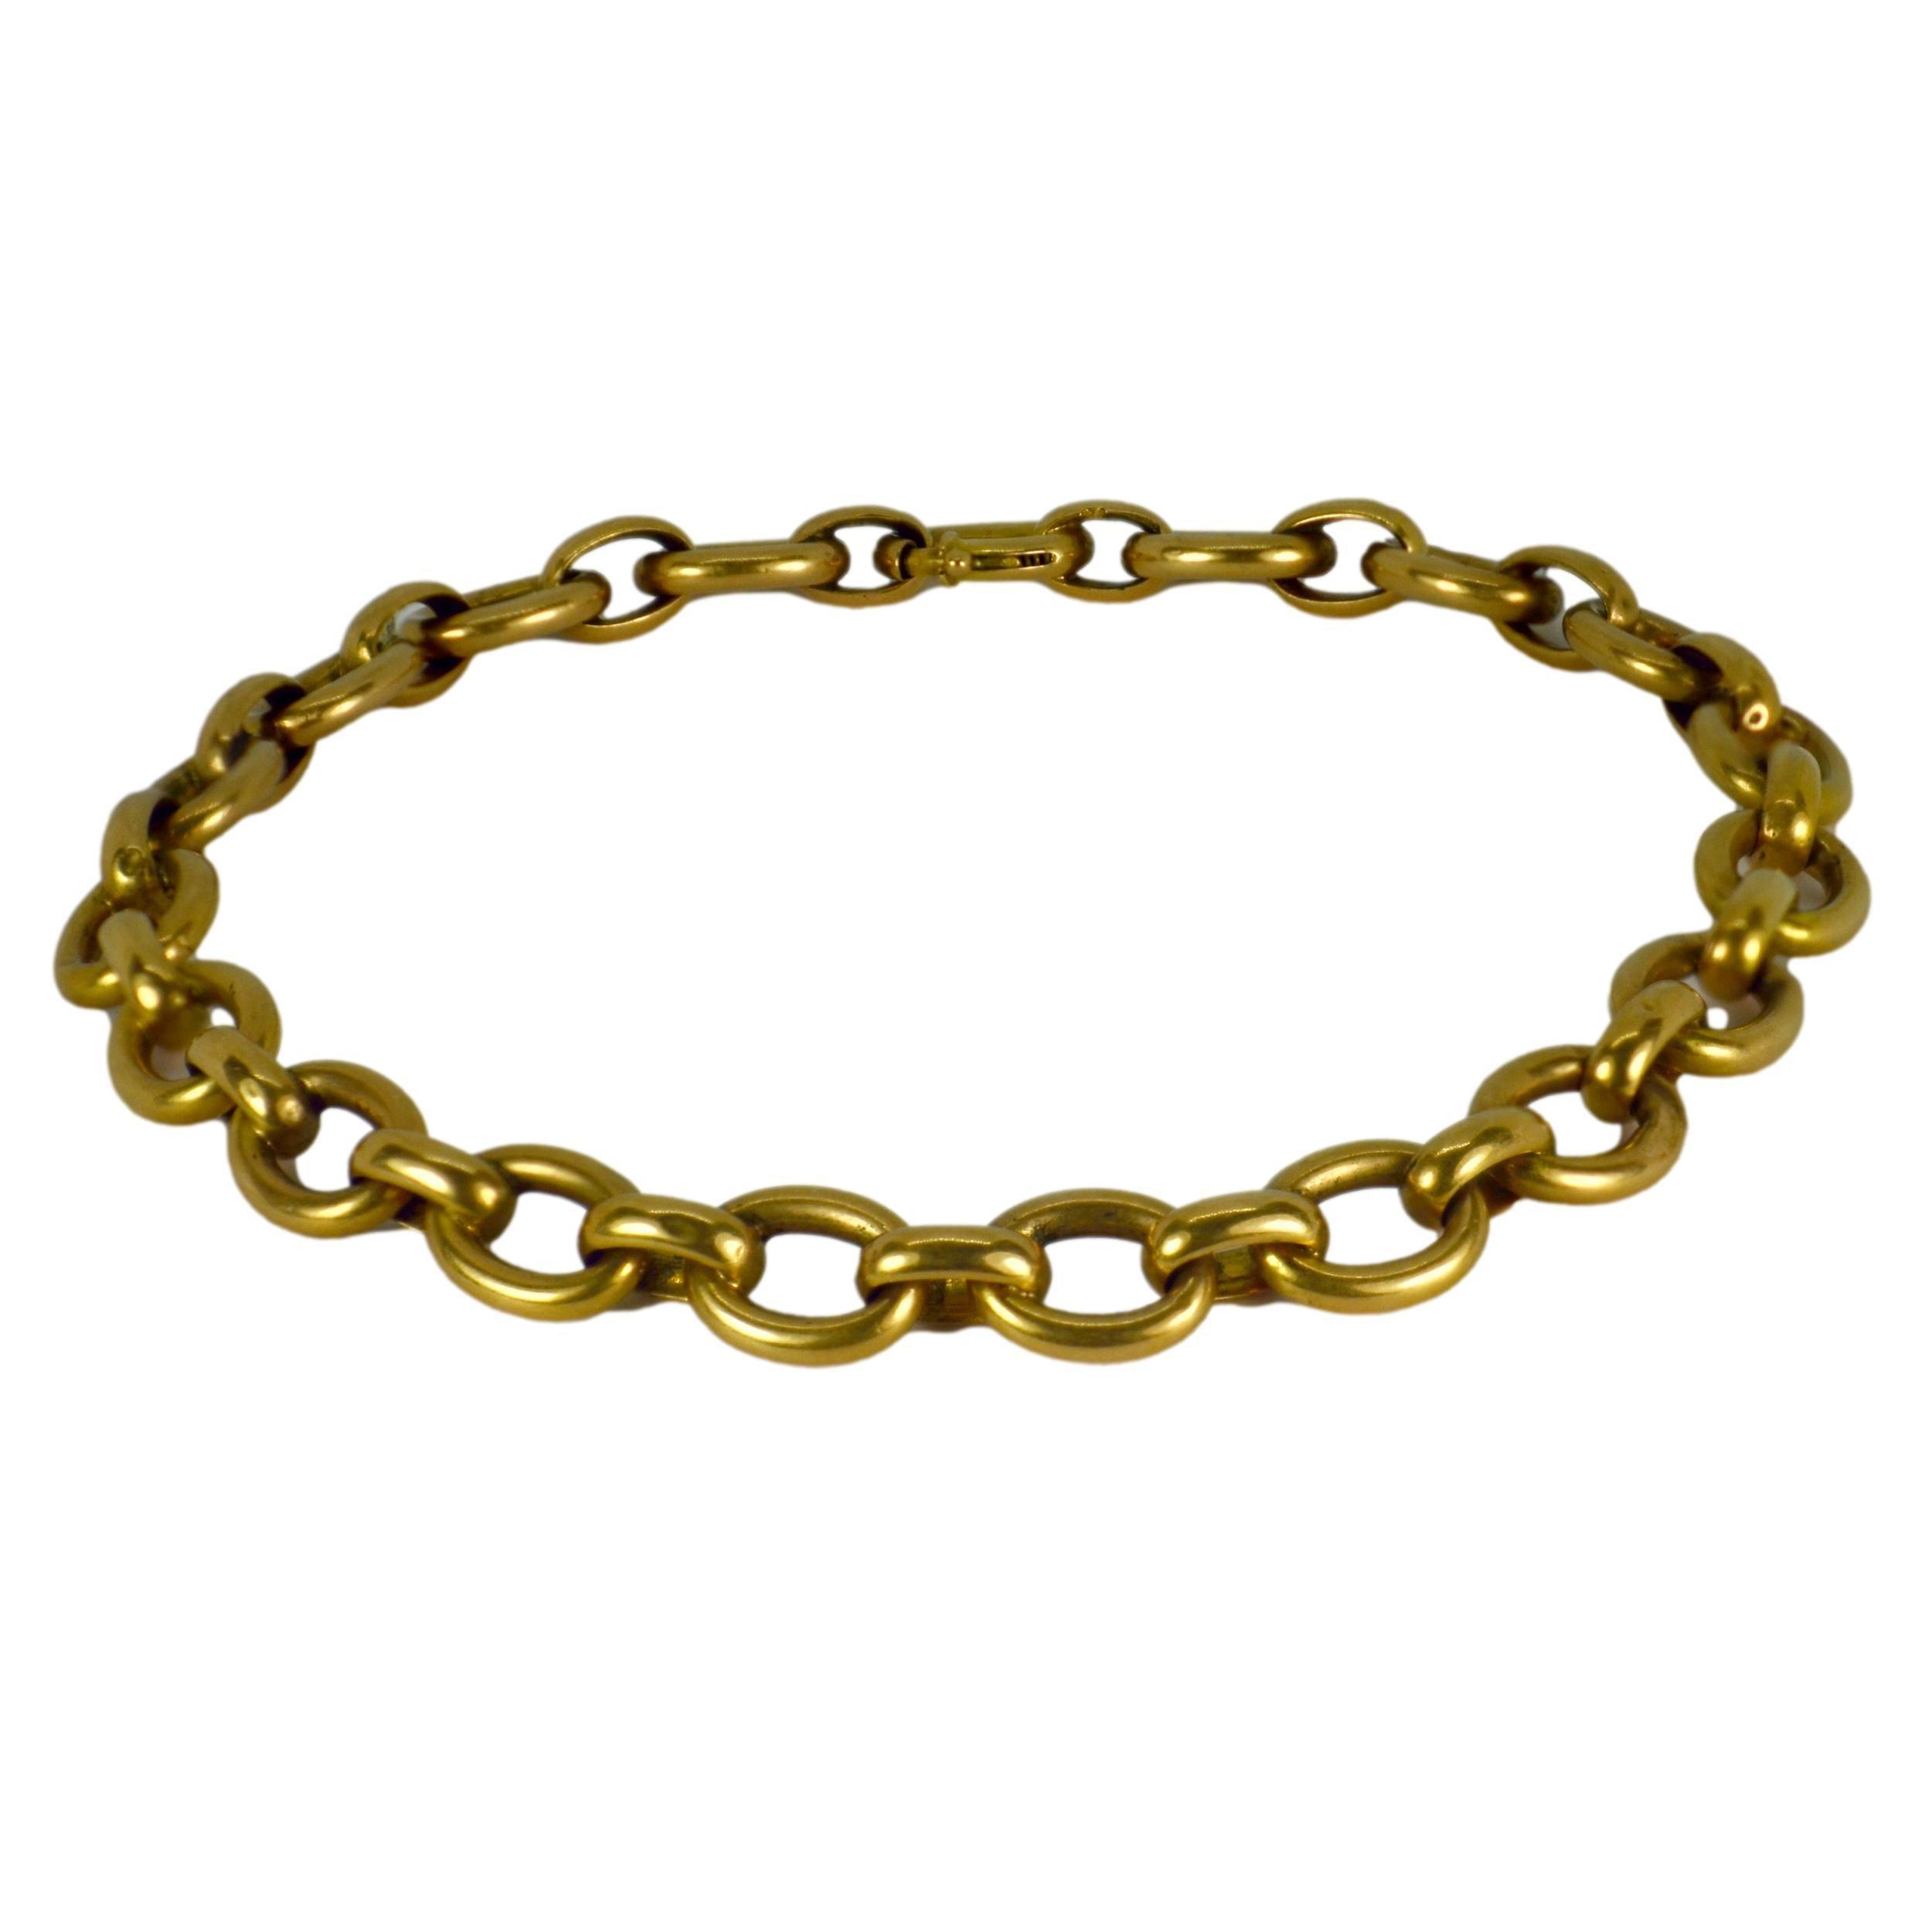 18K Yellow Gold Oval Link Bracelet